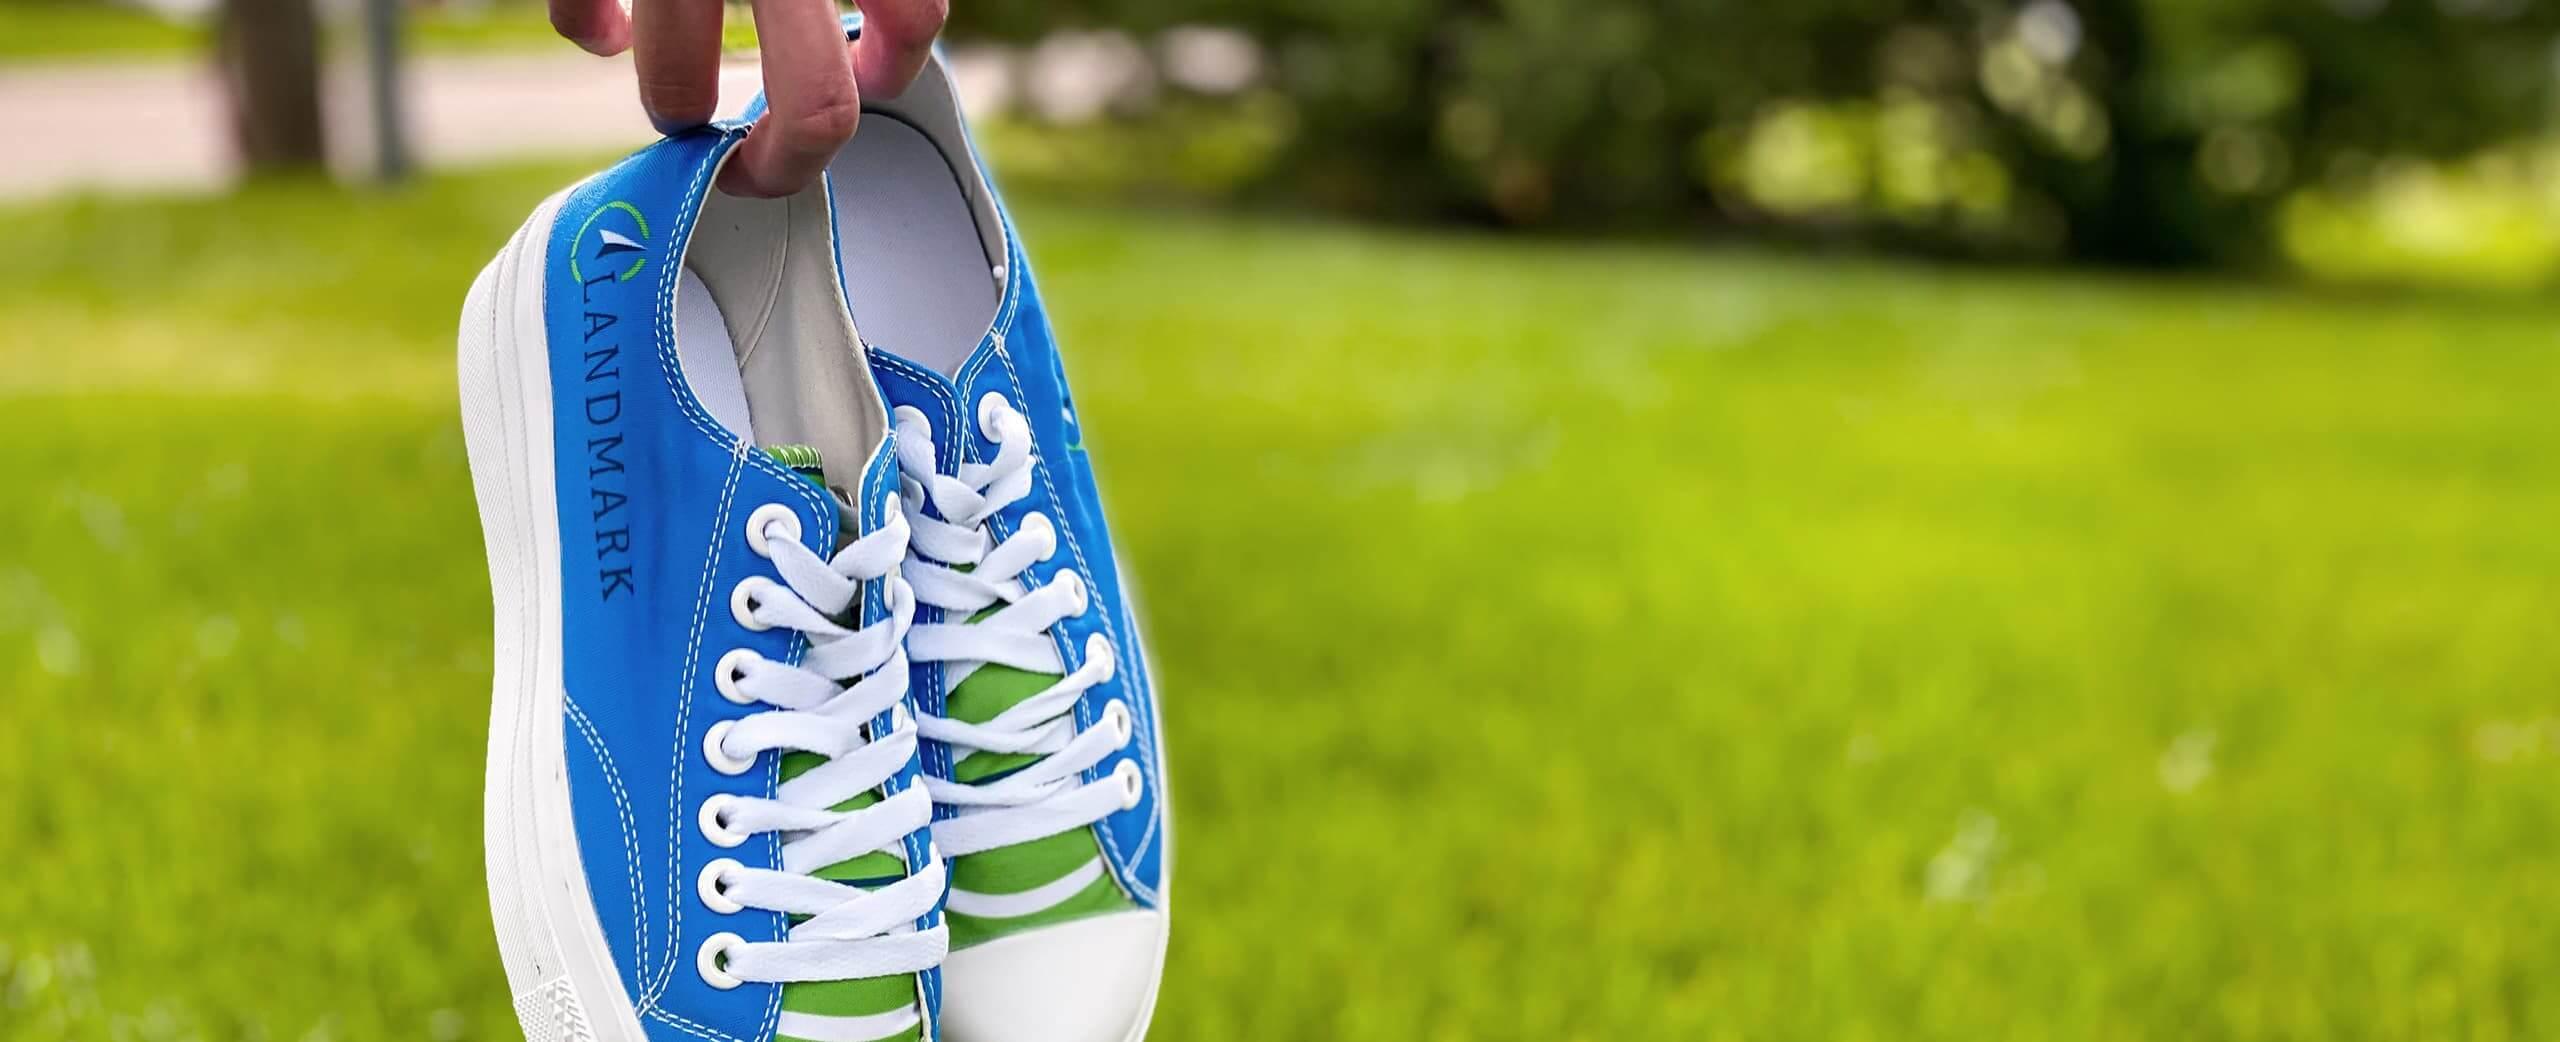 Landmark_shoes